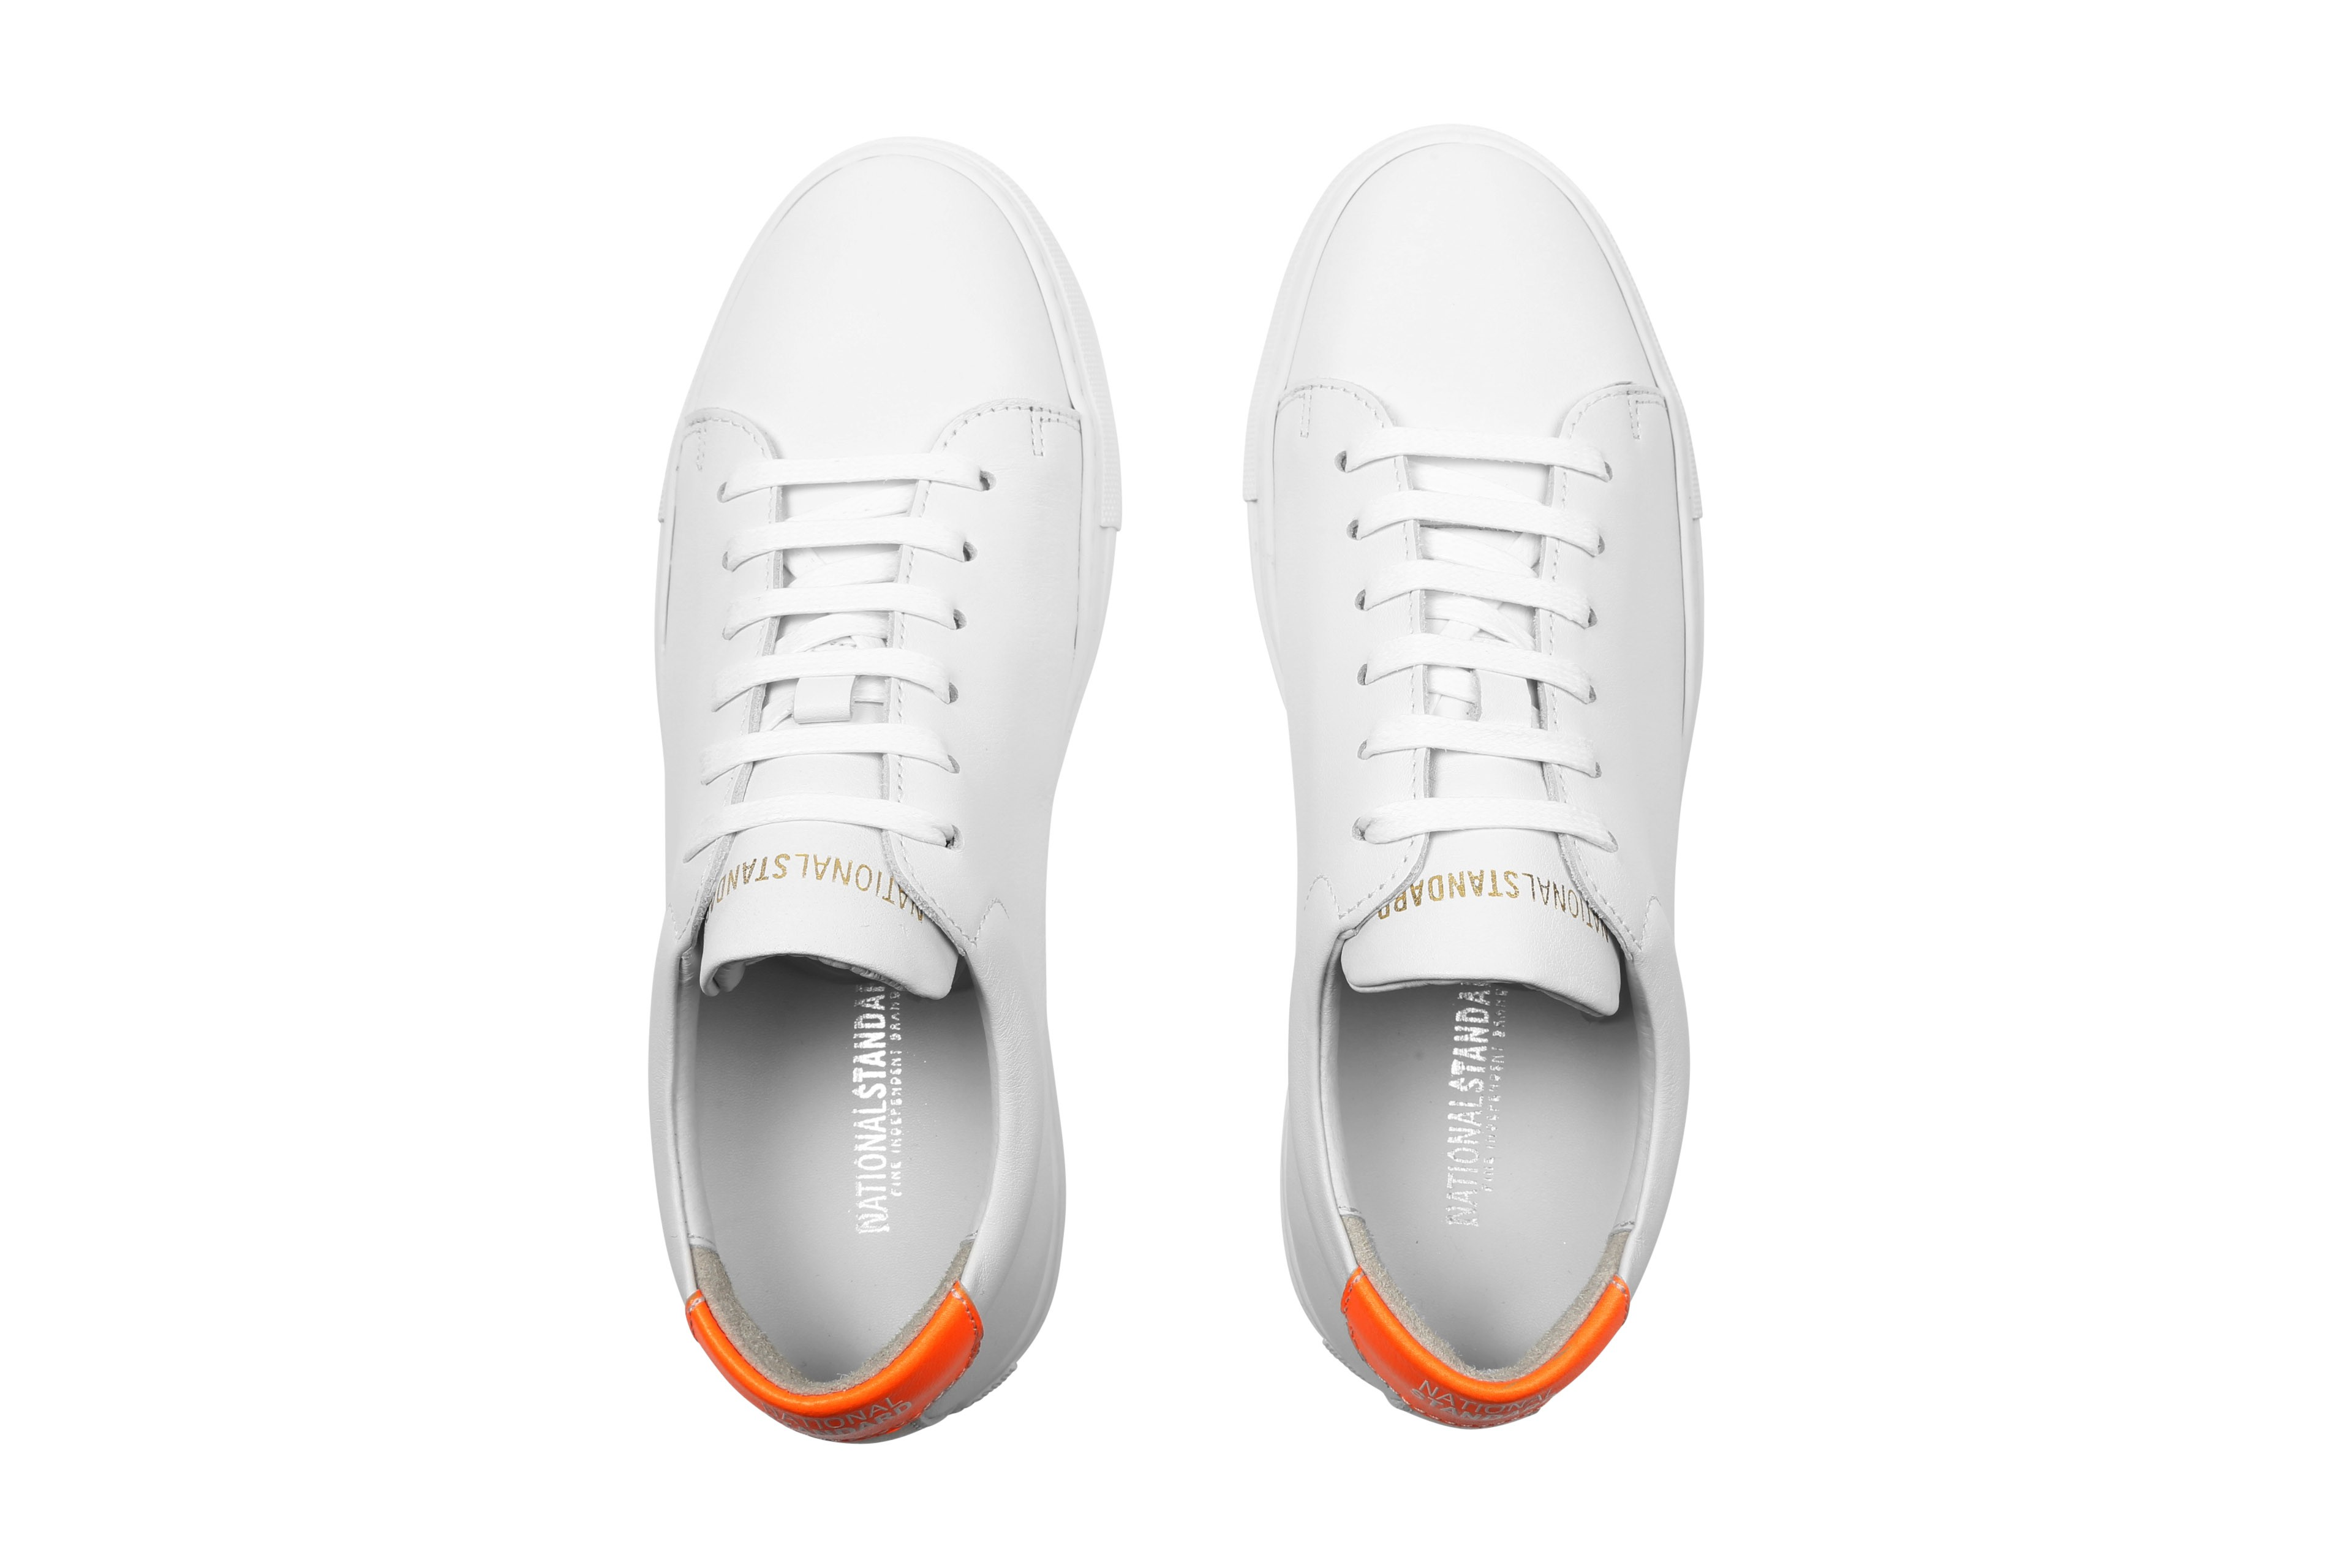 Edition 3 neon orange